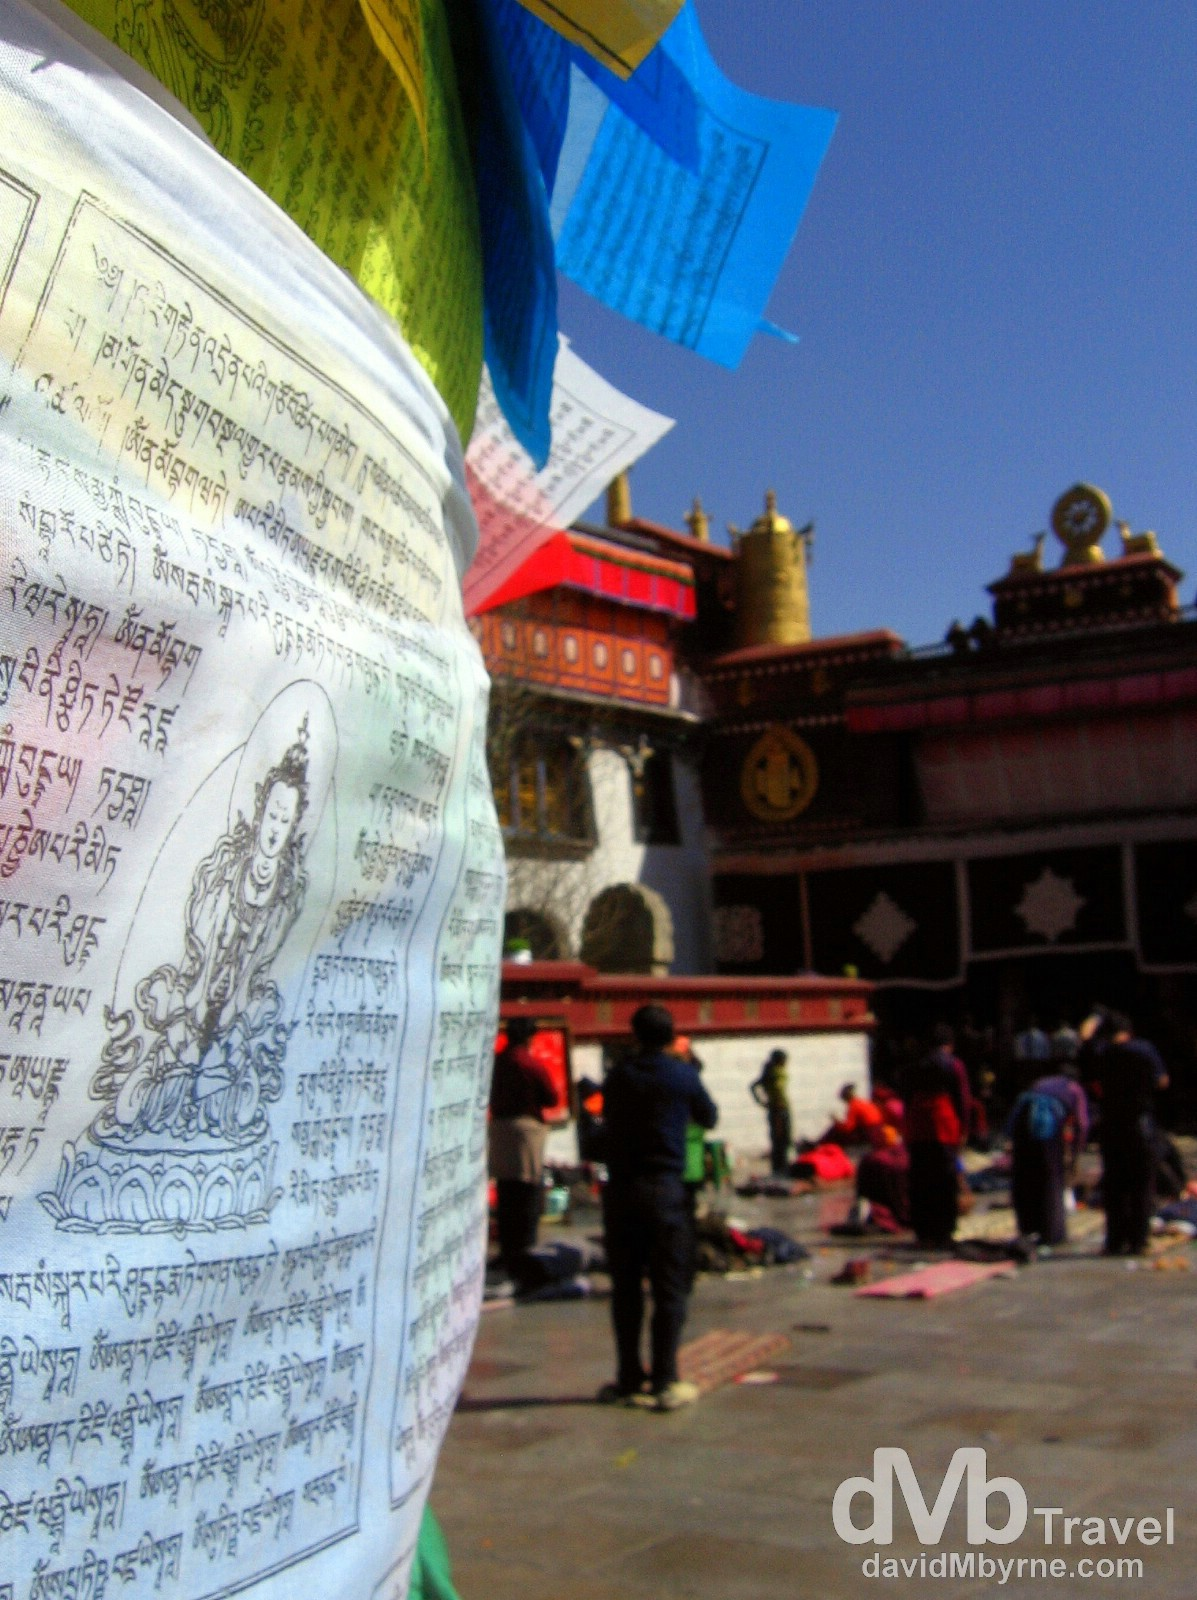 Barkhor Square, Lhasa, Tibet. February 25th, 2008.